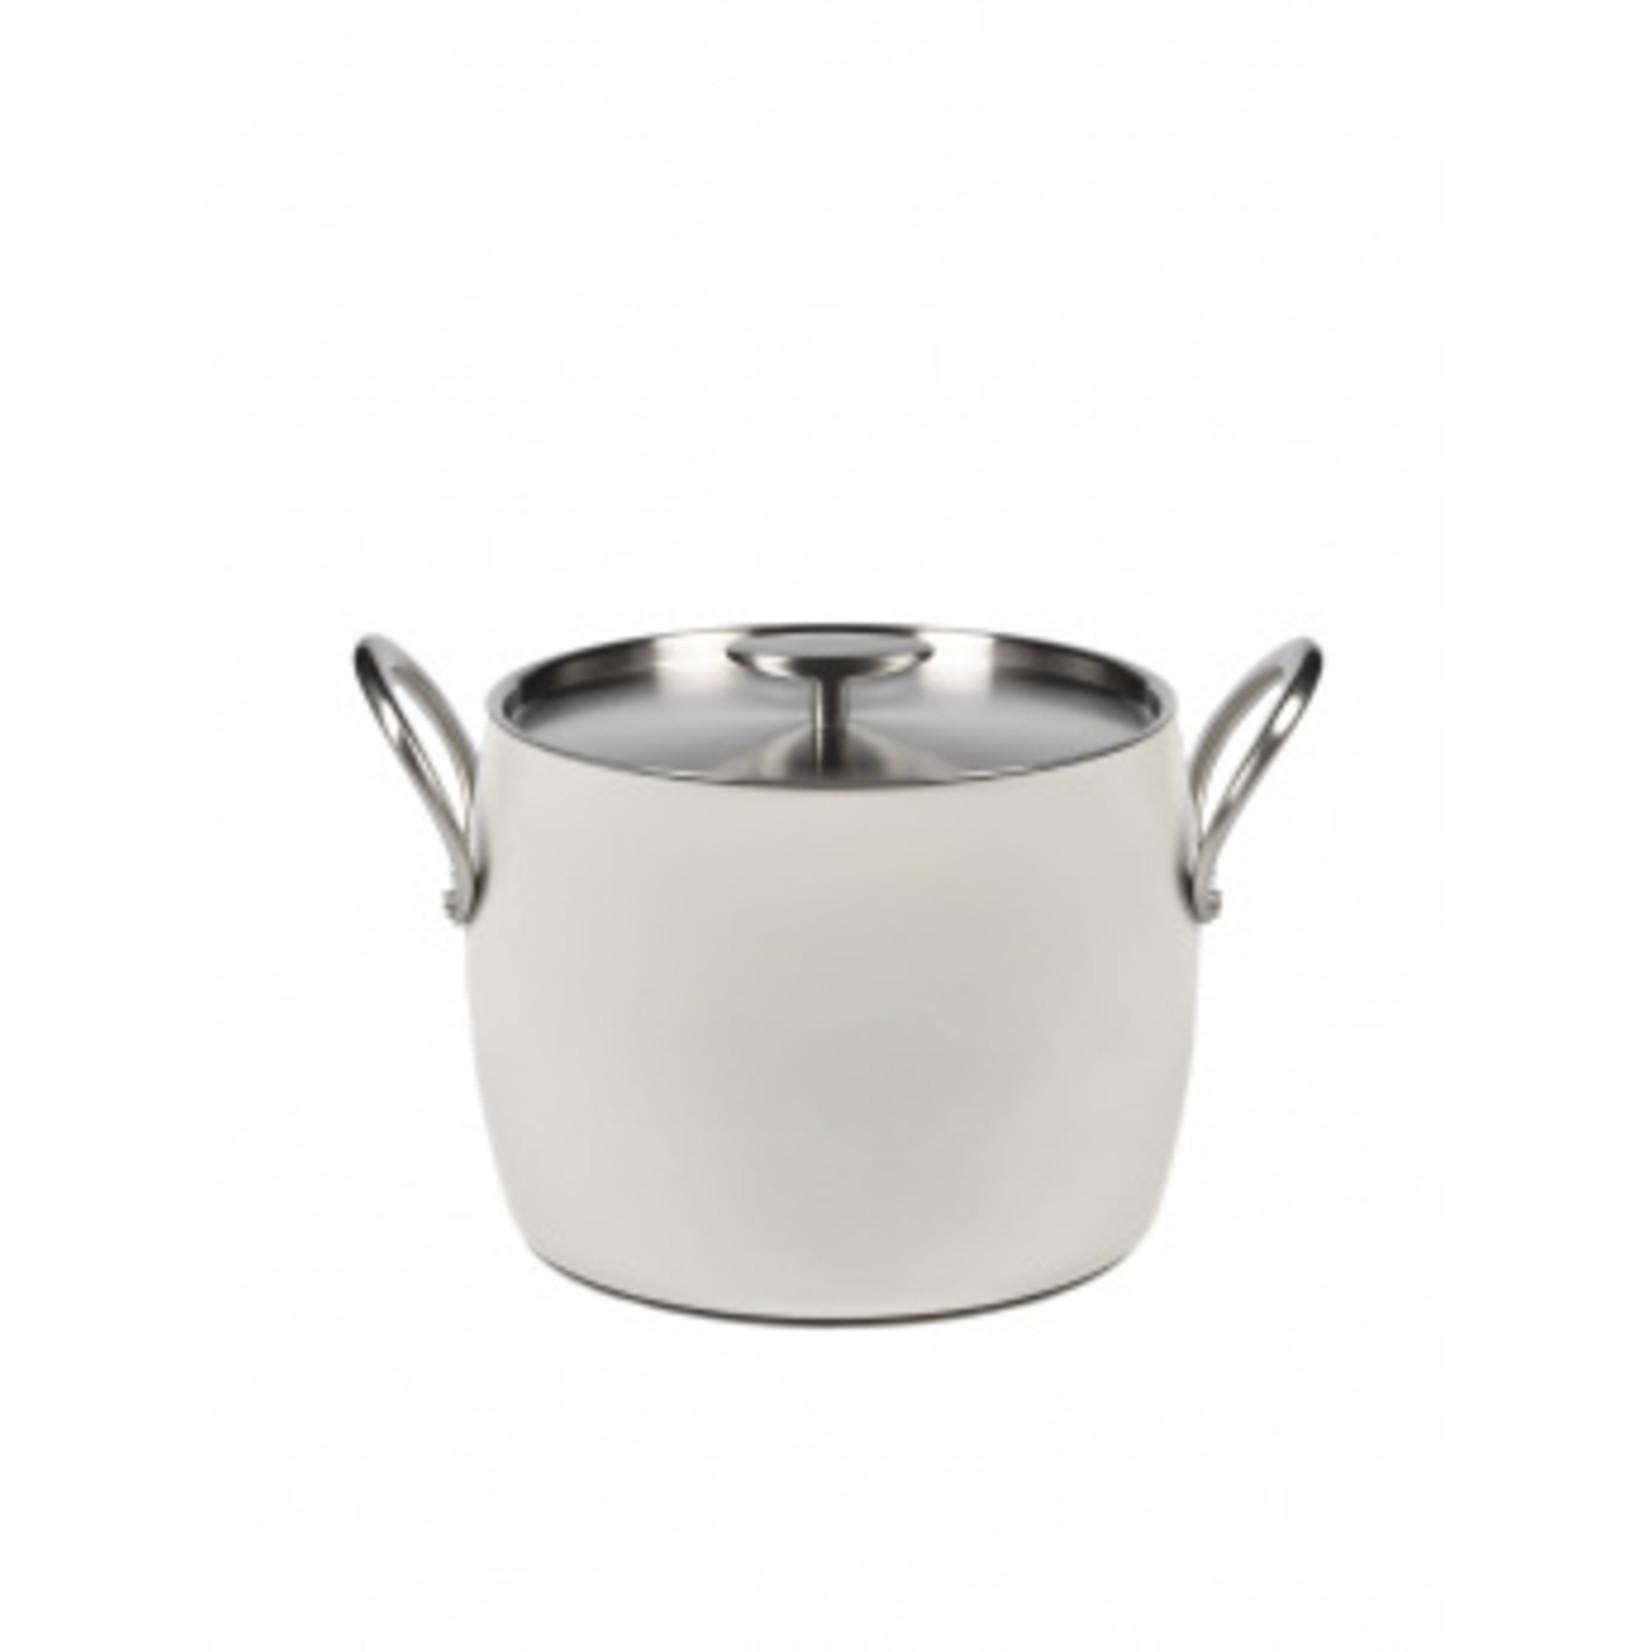 Pascale Naessens collection Pure Anti-kleef kookpot Aluminium 7,5 l